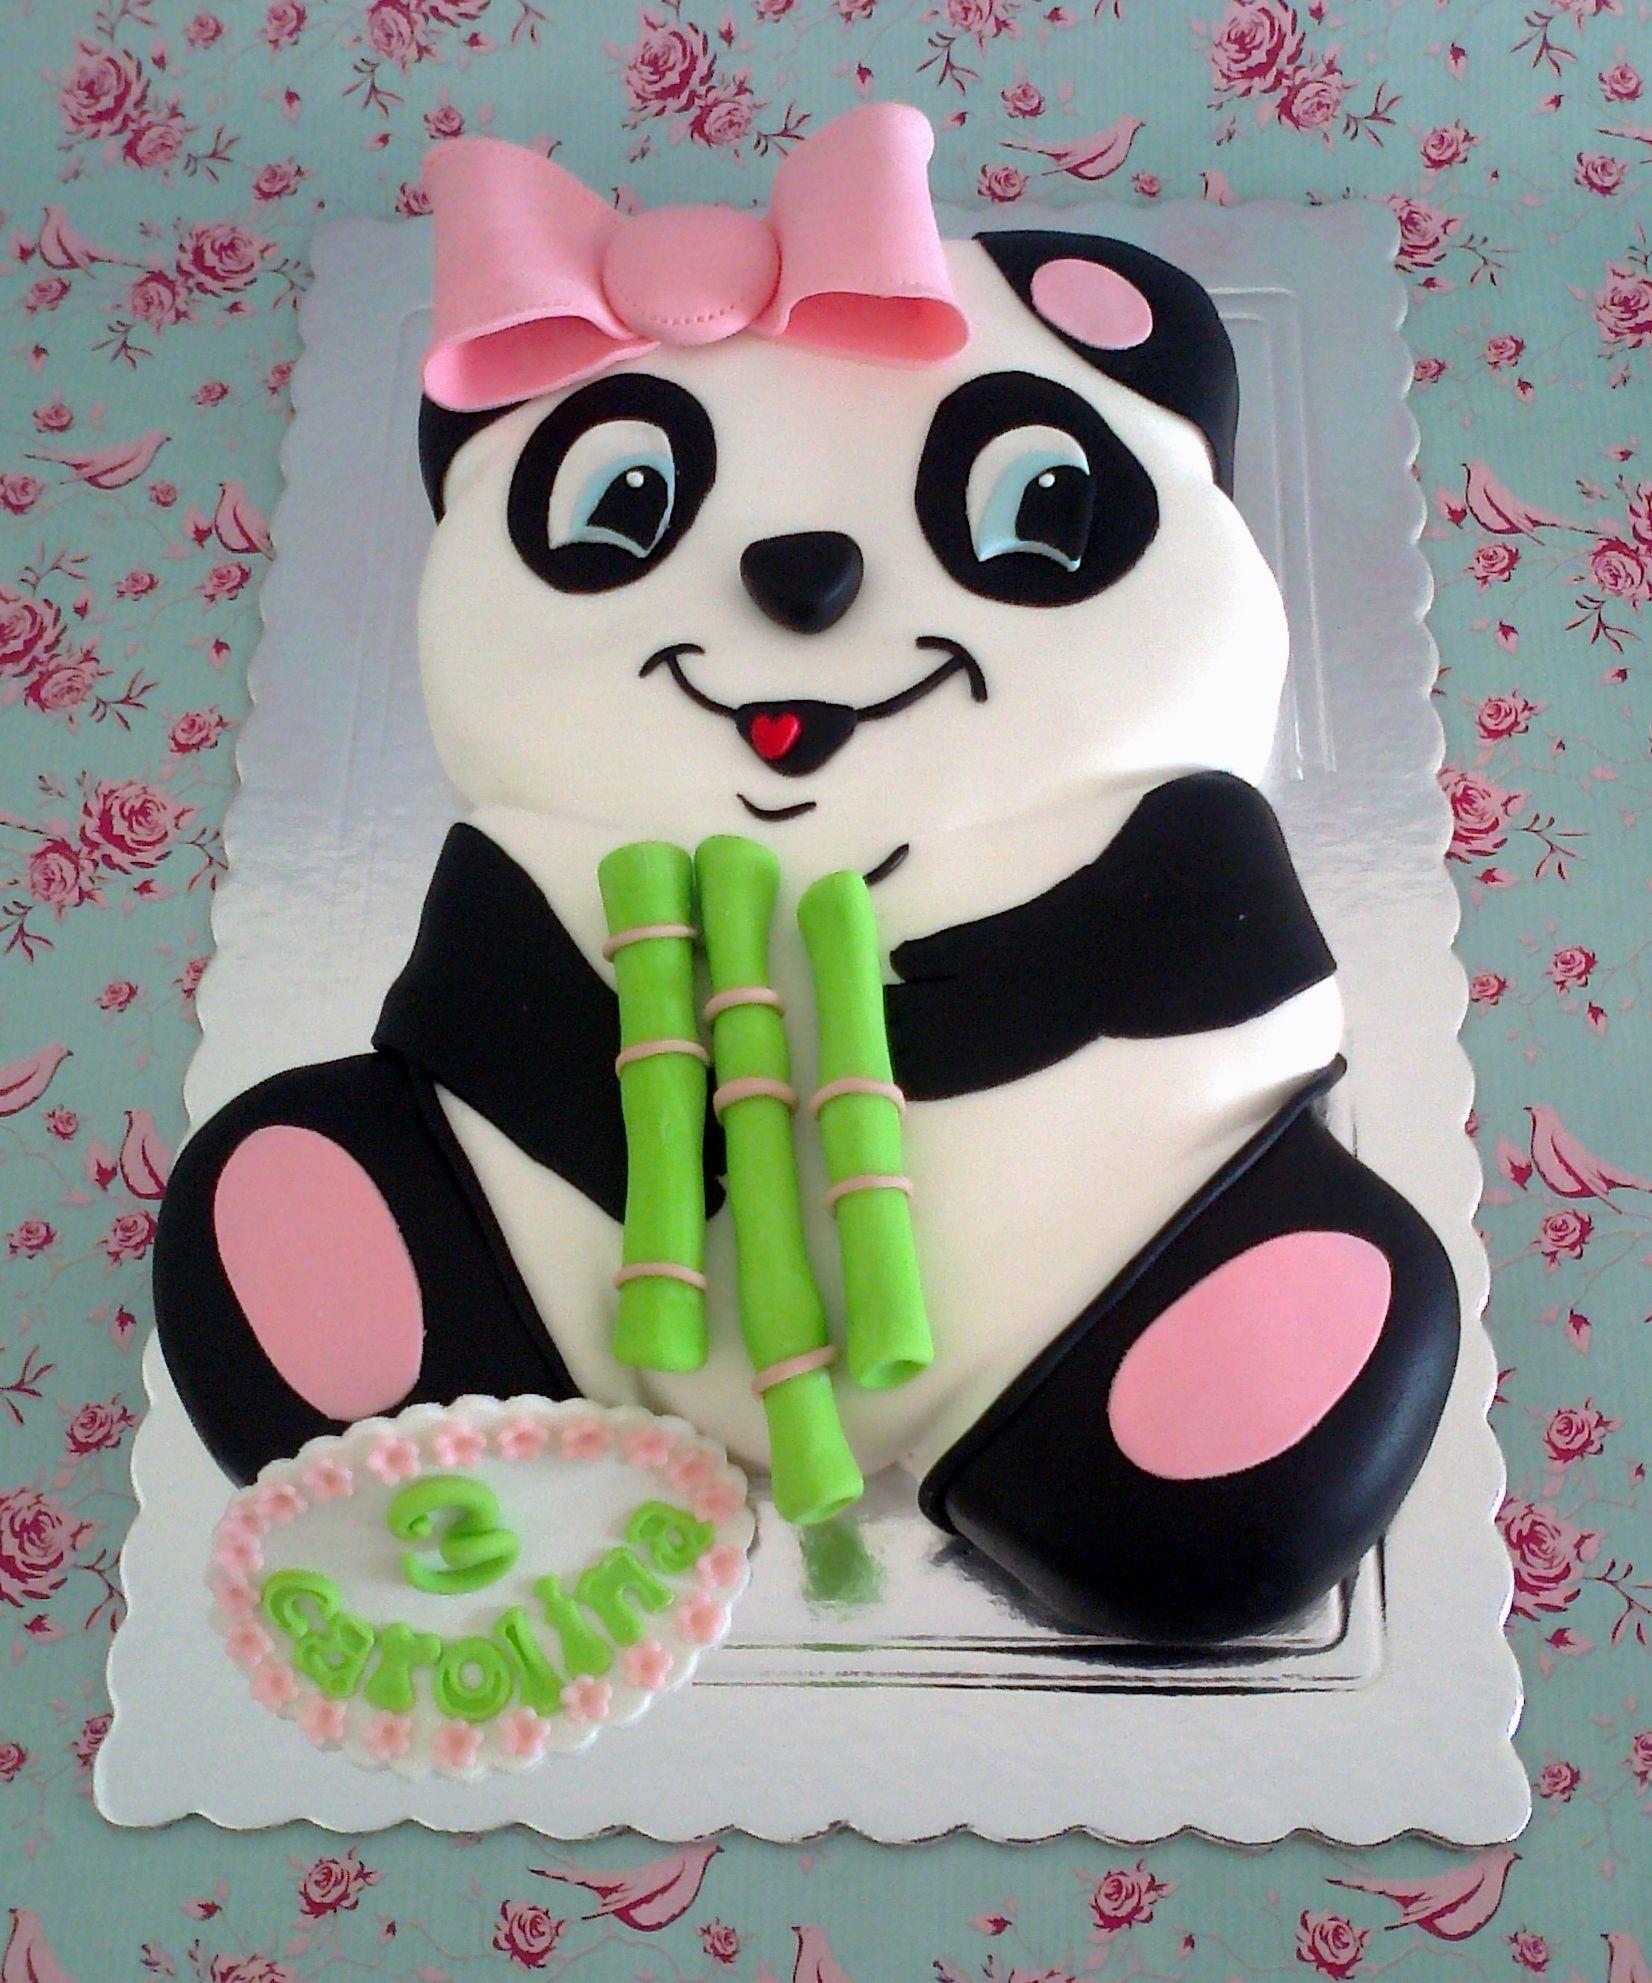 Fine Panda Cake To Cute Panda Birthday Cake Panda Cakes Panda Funny Birthday Cards Online Alyptdamsfinfo